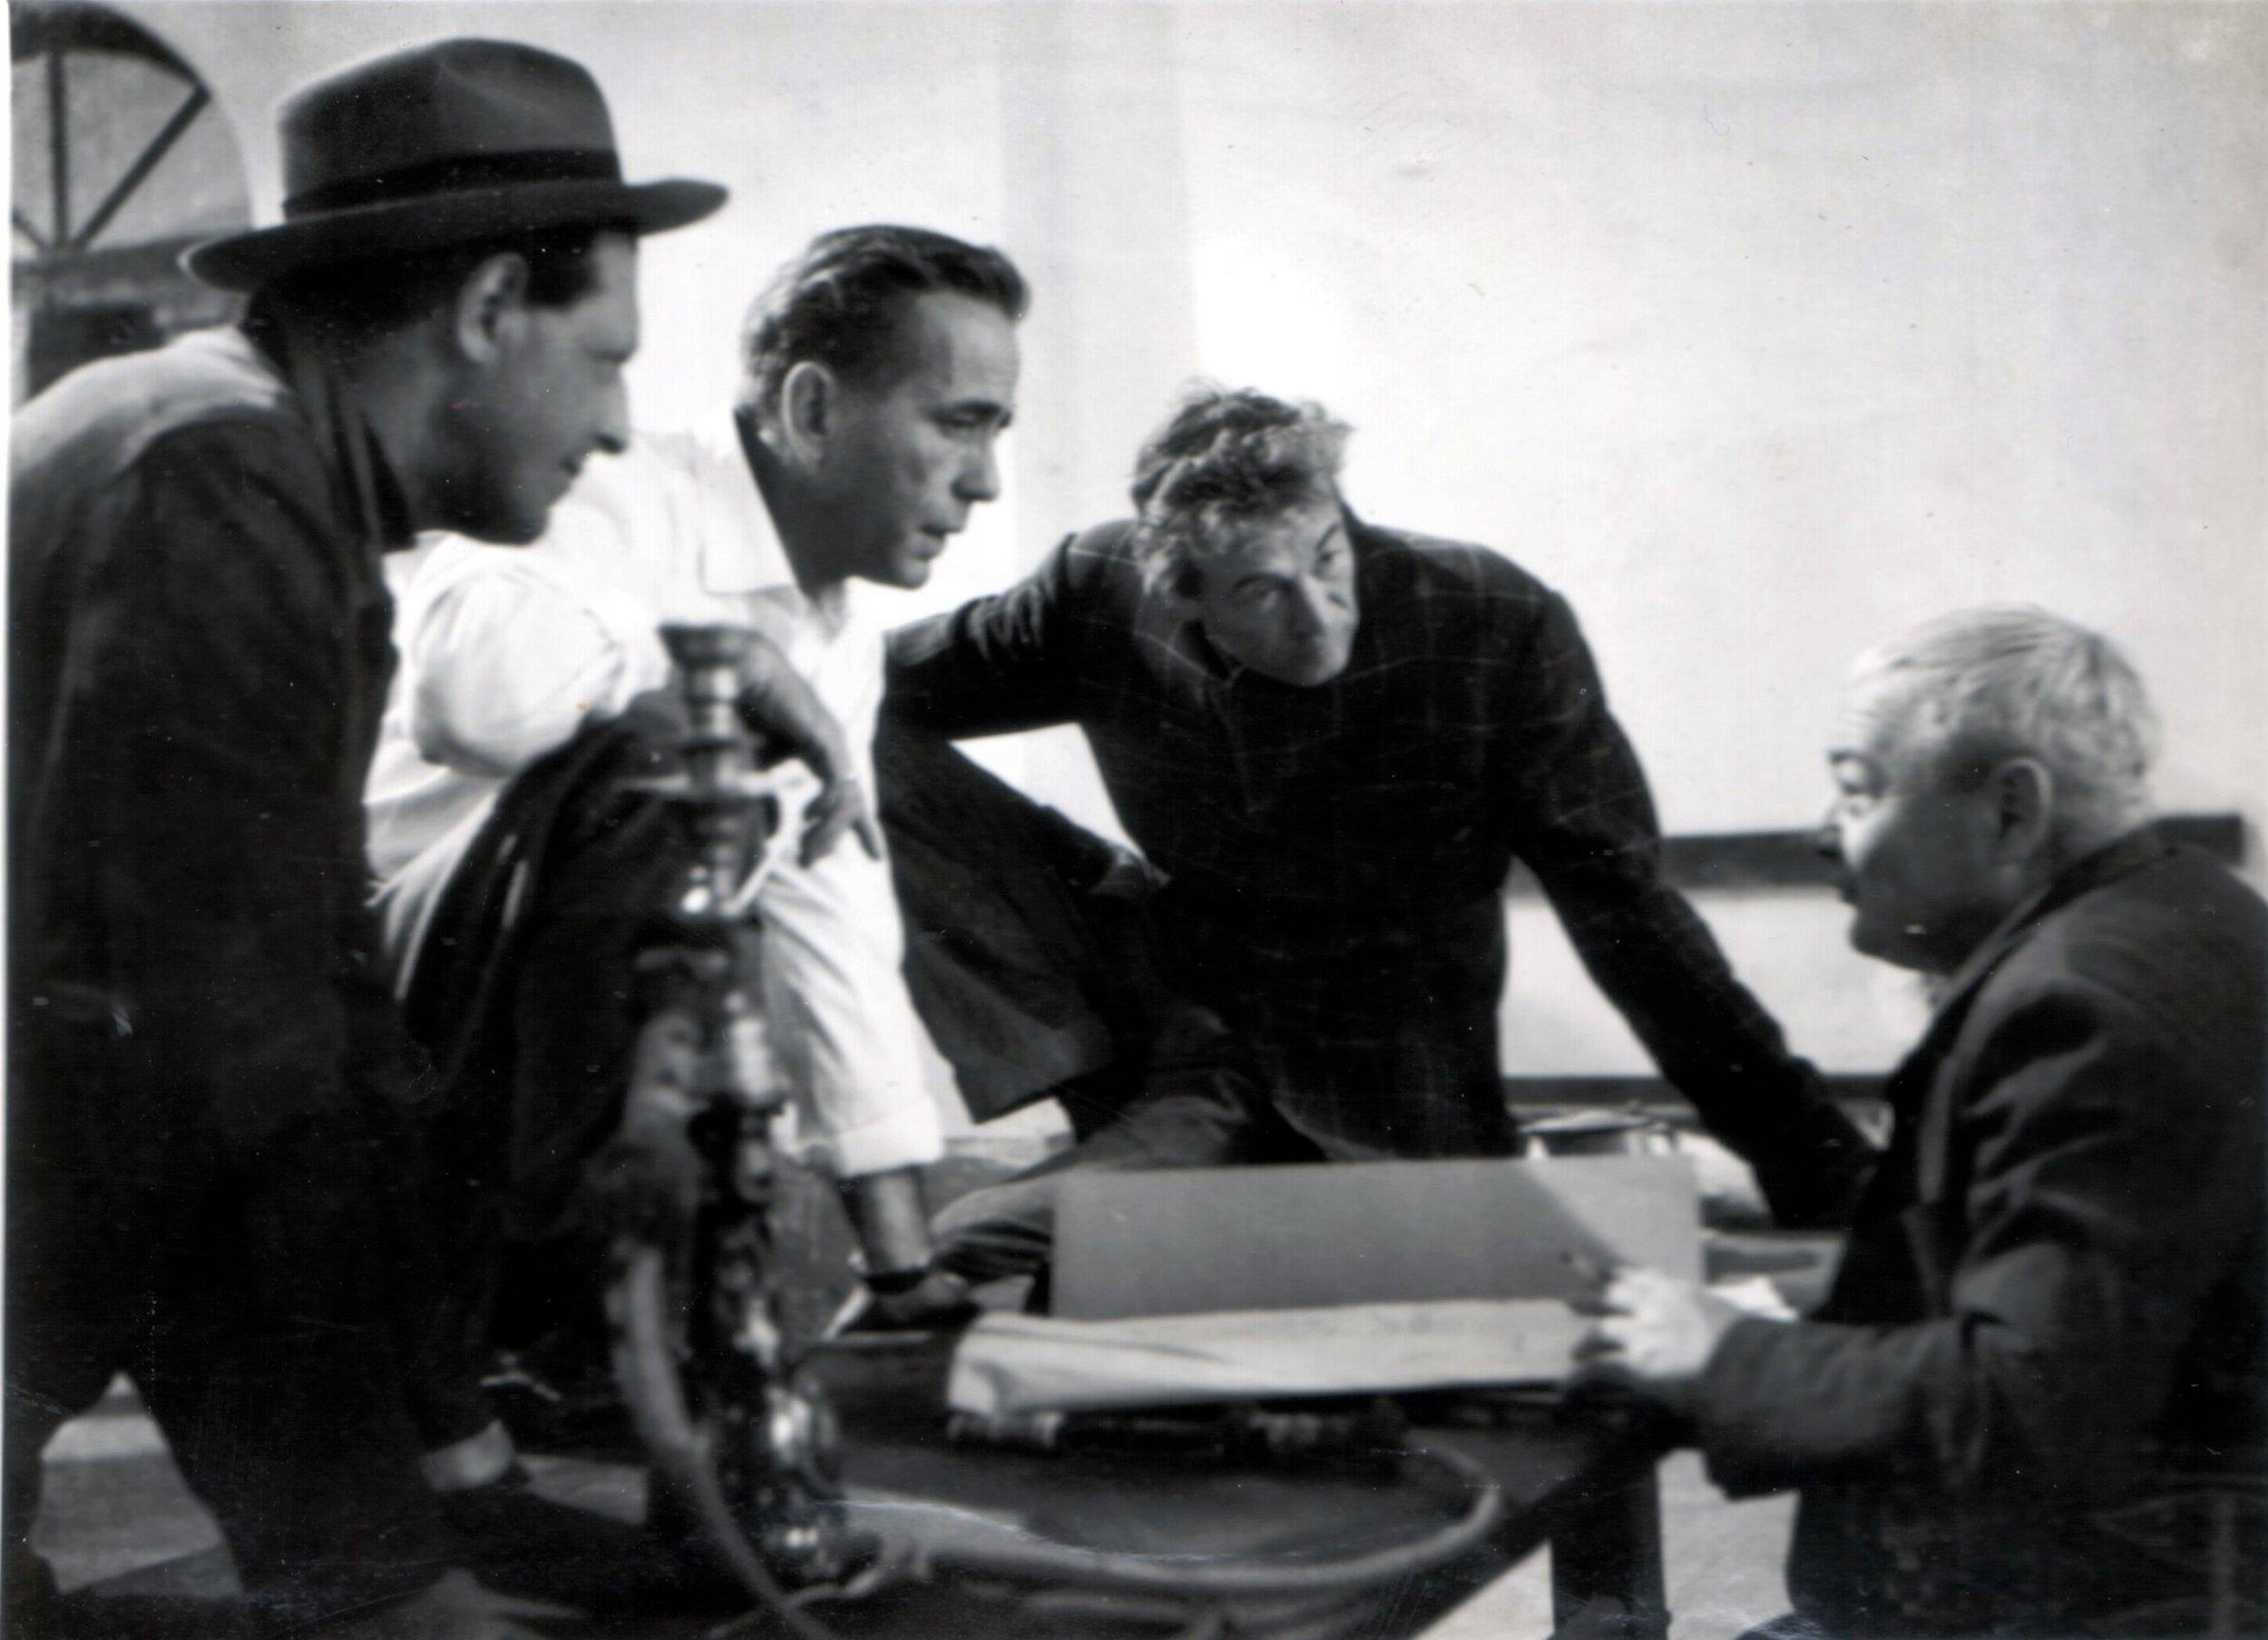 126 A Tasca, Bogart, Huston, Lorre villa ama sicily.jpg